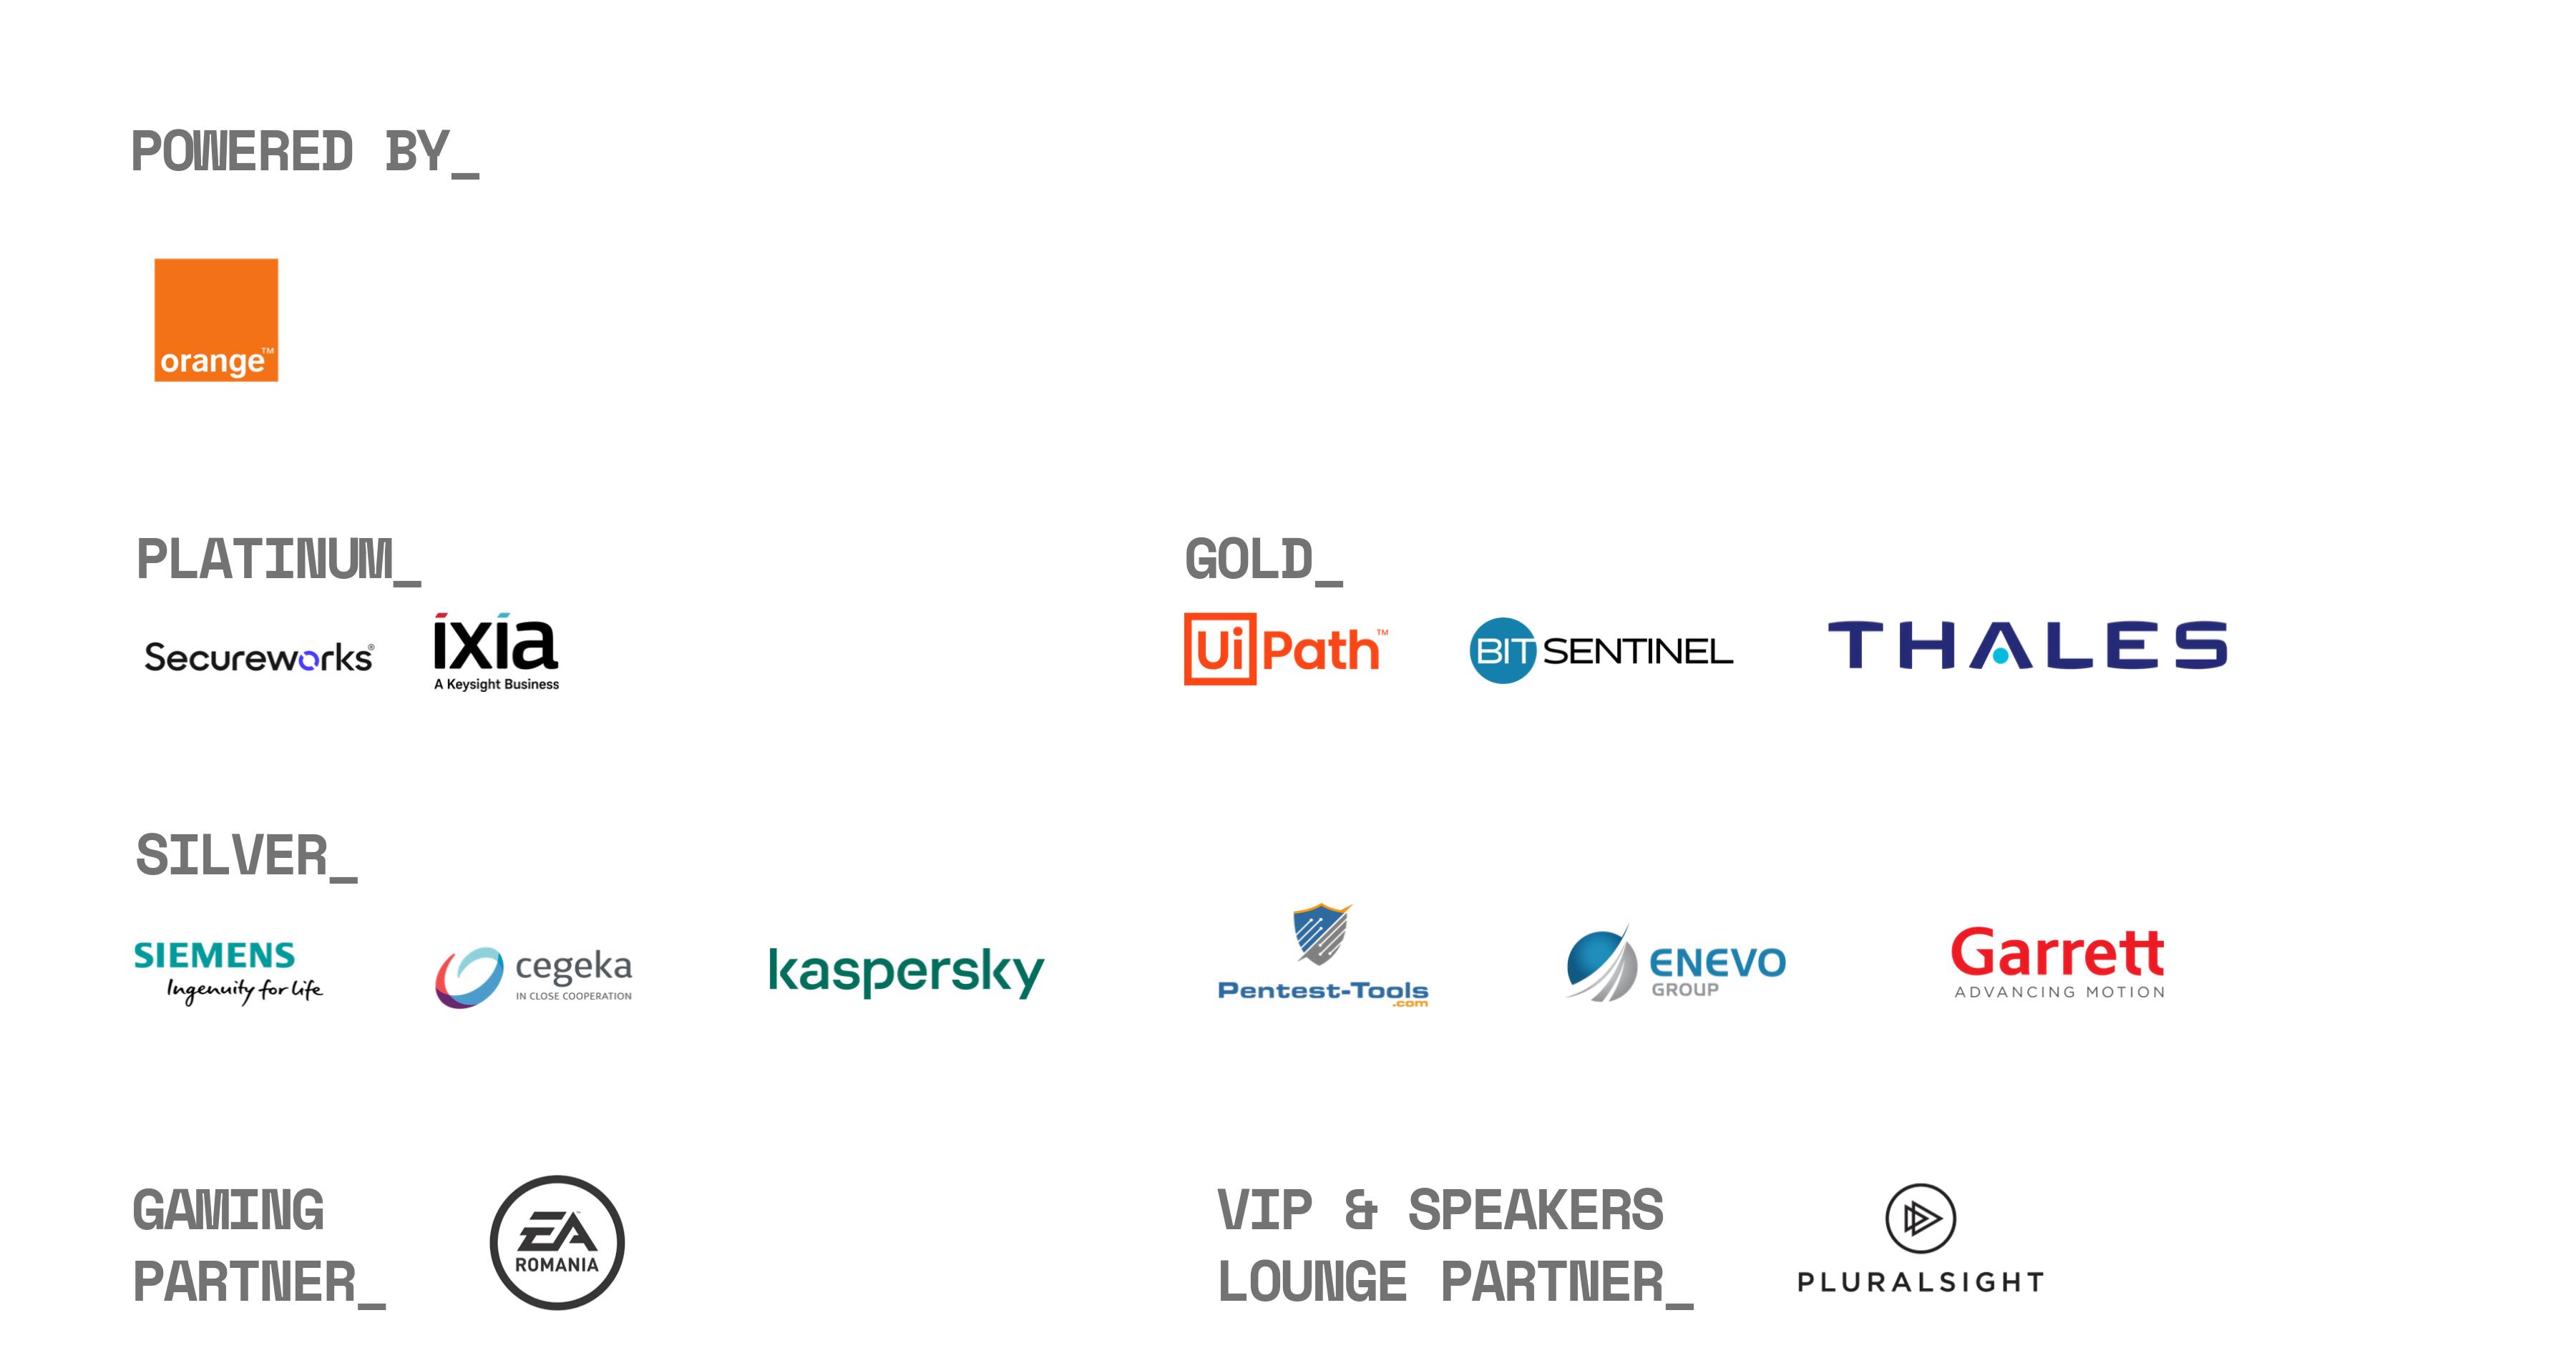 defcamp 10 partners 2019